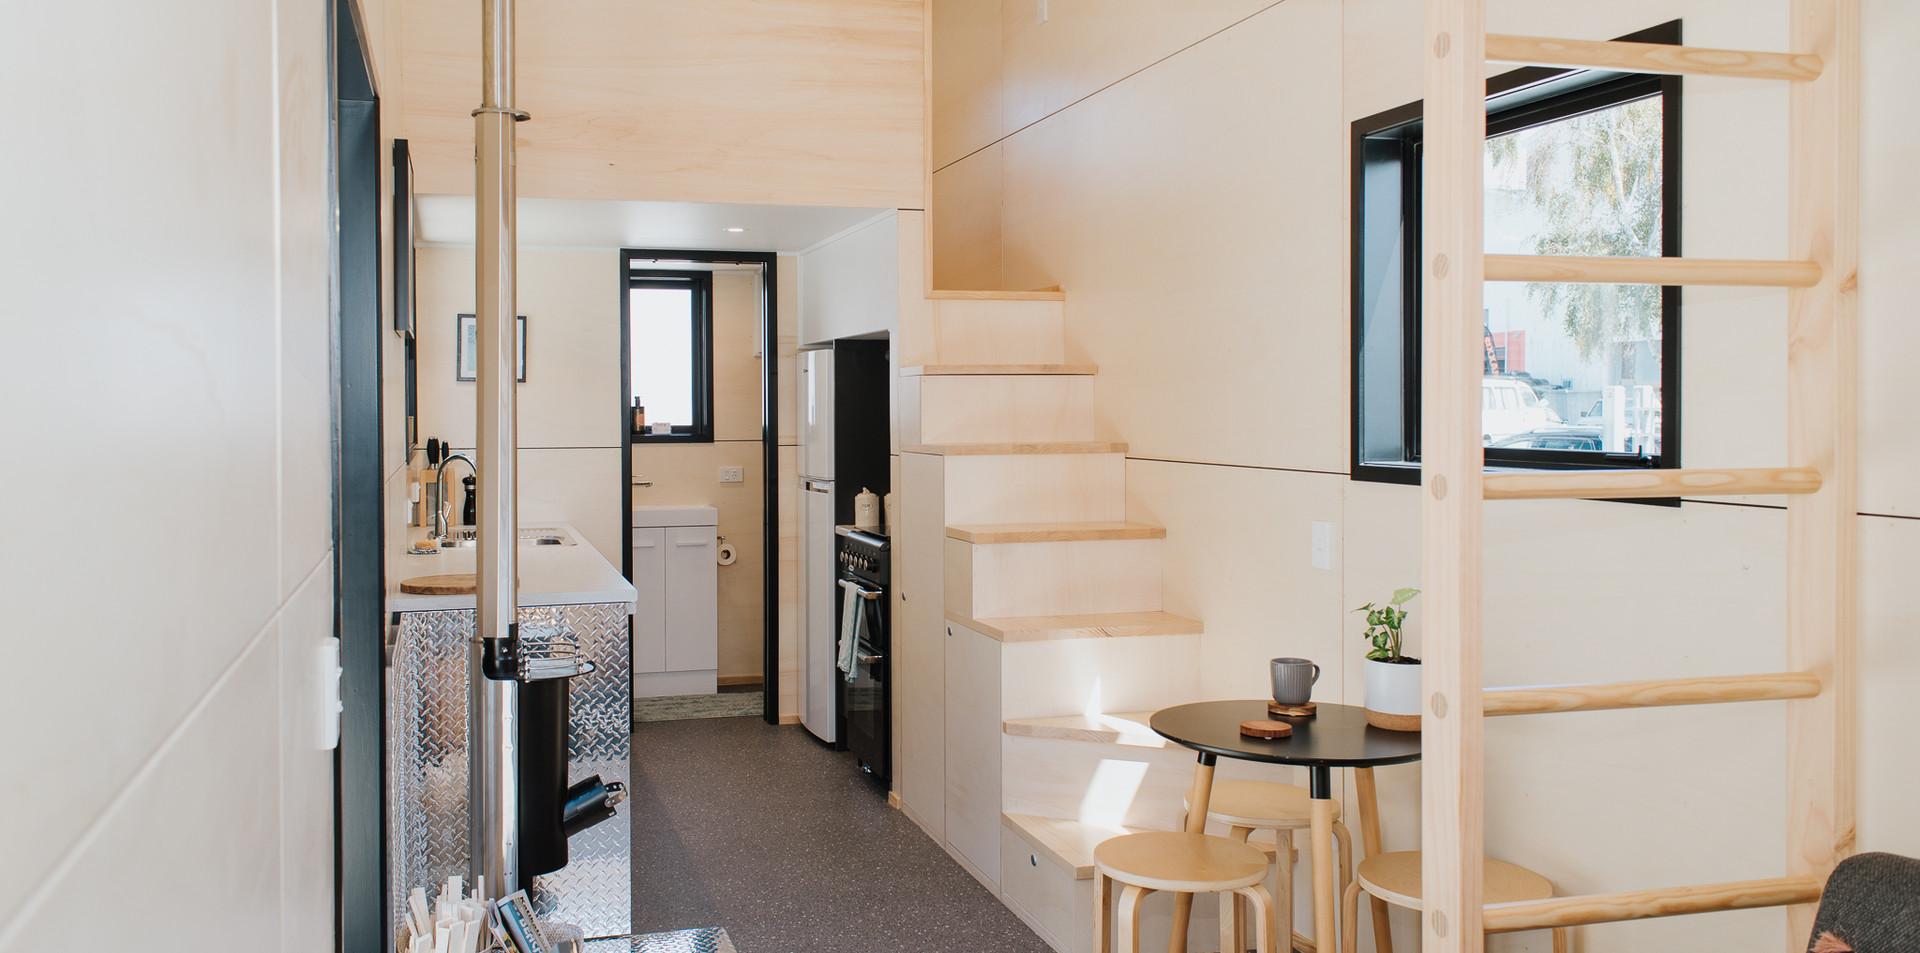 La Sombra Tiny House